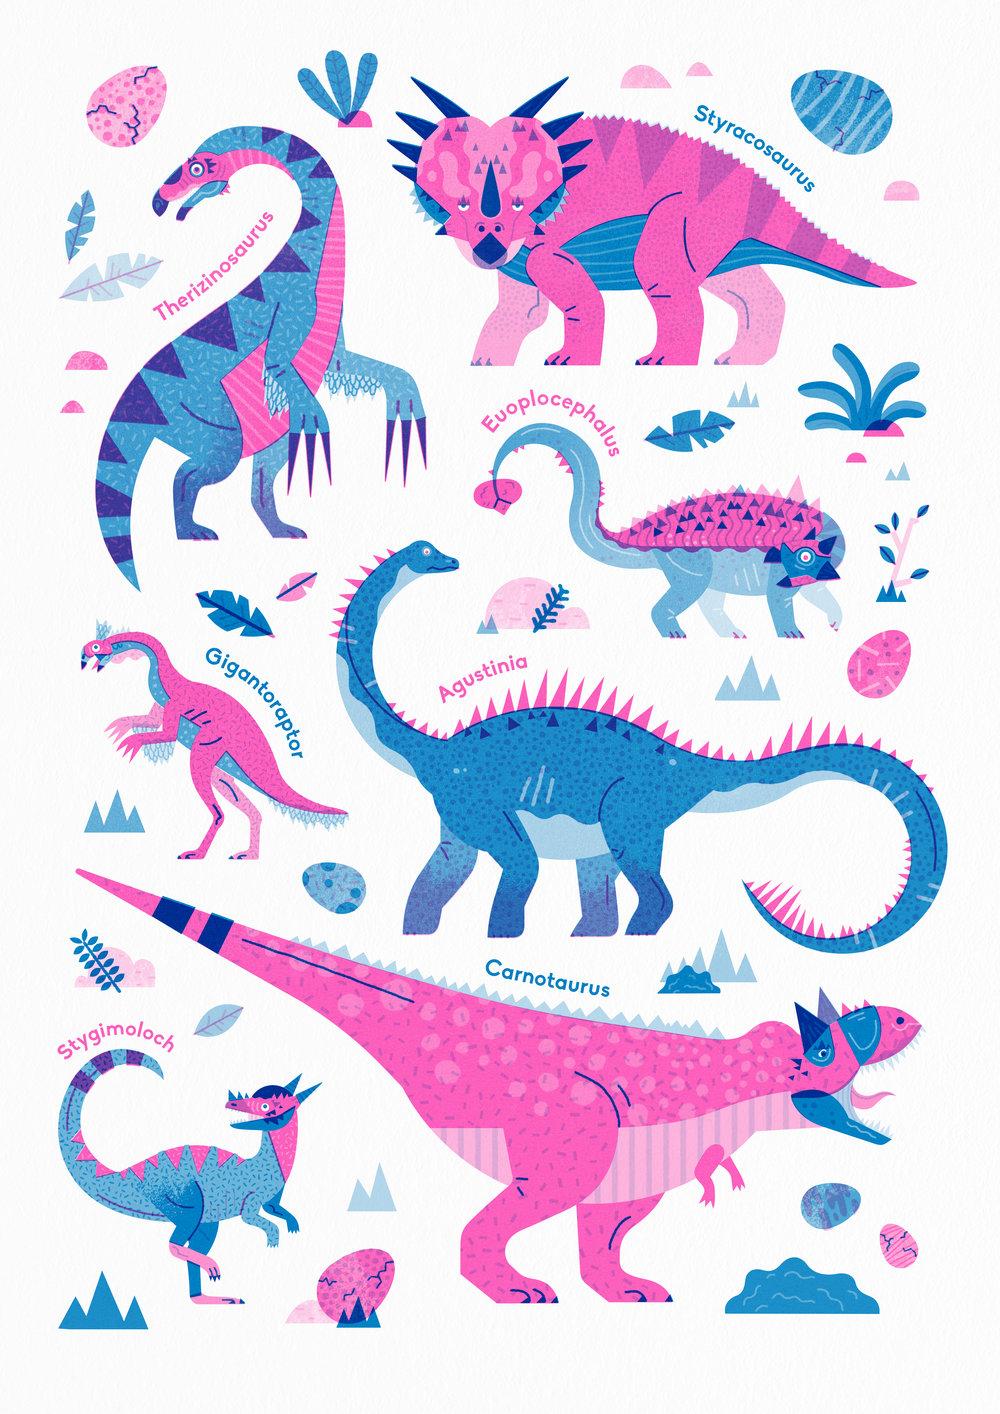 Crazy Cretaceous Creatures Dinosaur riso print